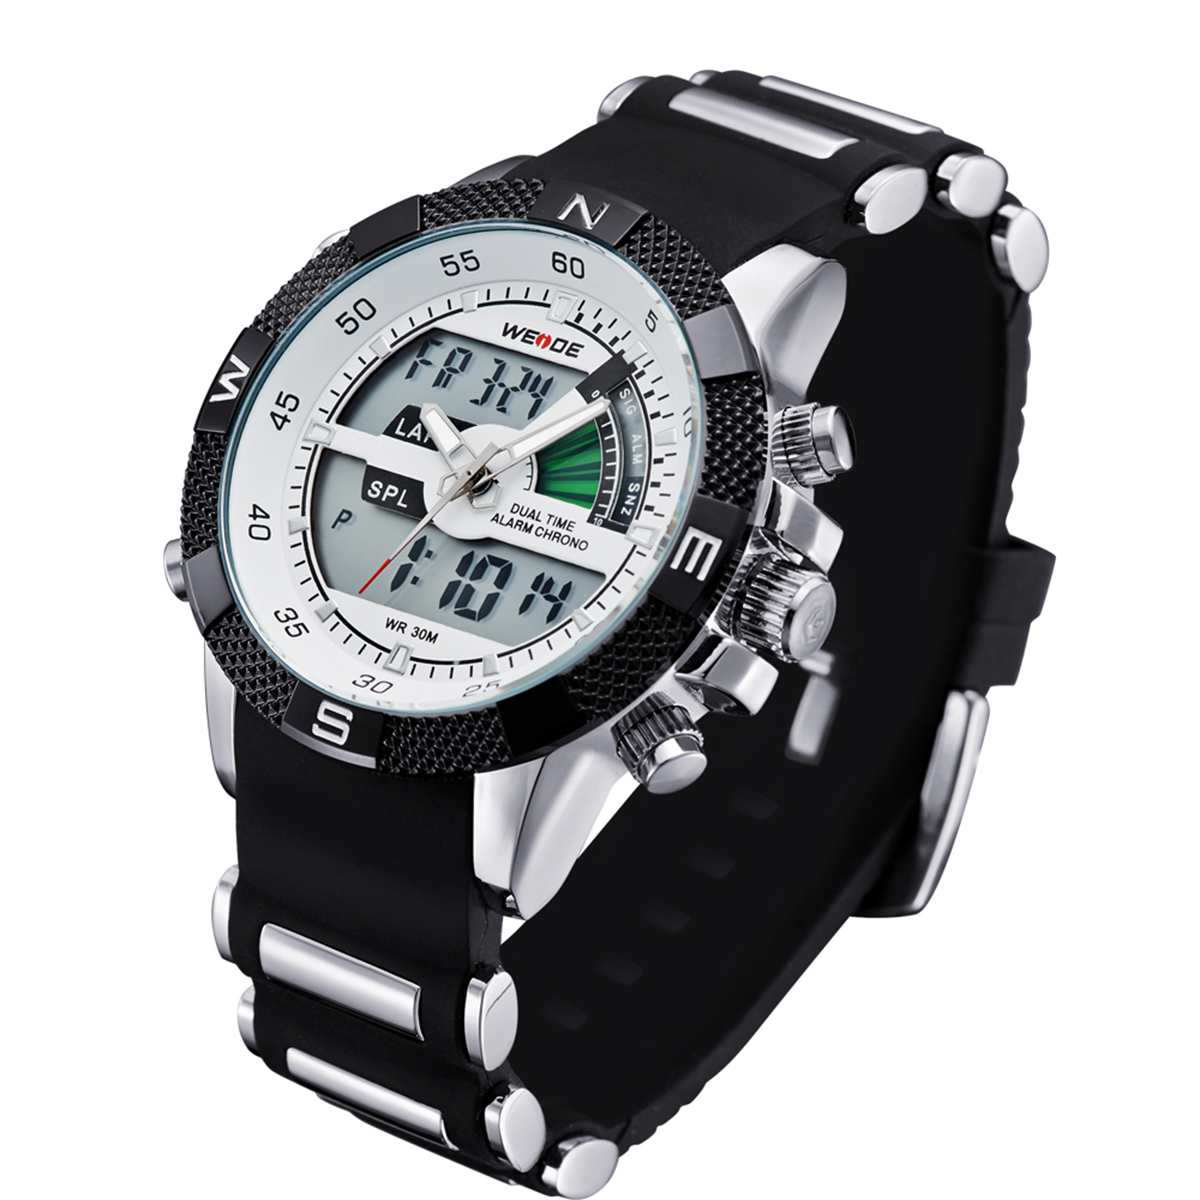 WEIDE WH1104PU-BW Men's Resin Band Quartz Digital Analog Wrist Watch - White